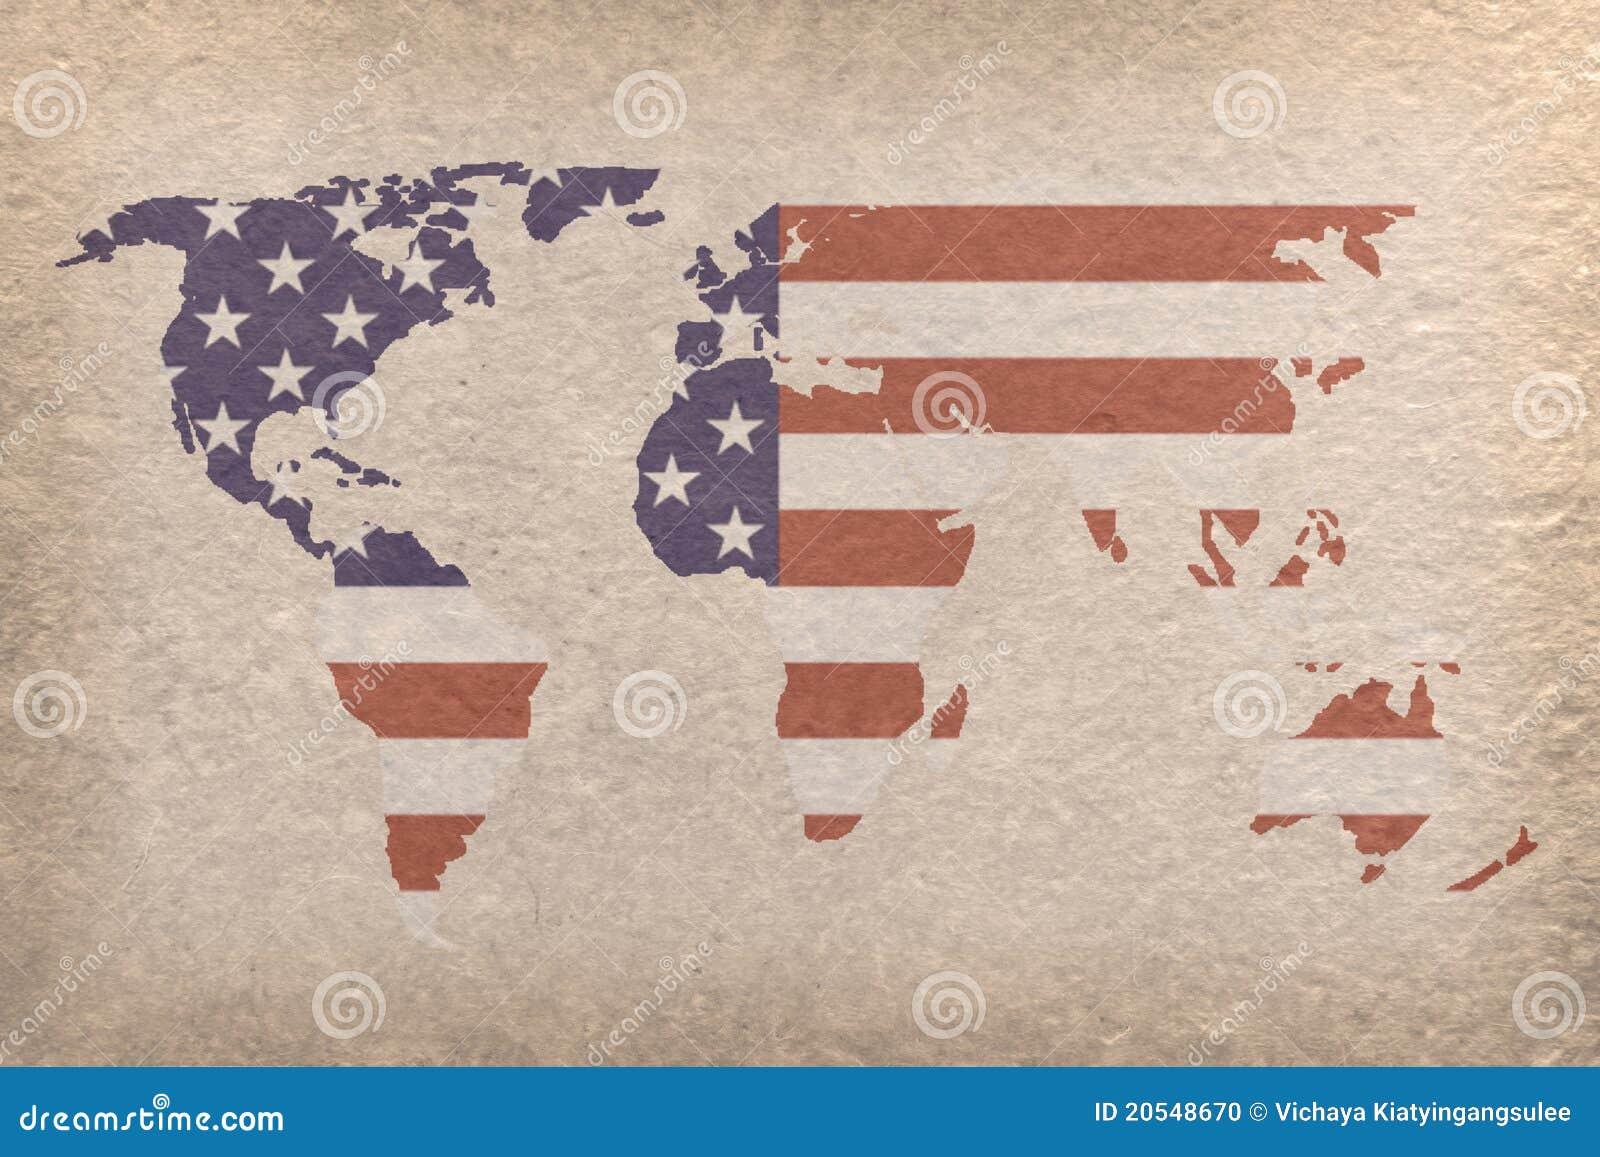 USA World Map Photo Image 20548670 – Usa in World Map